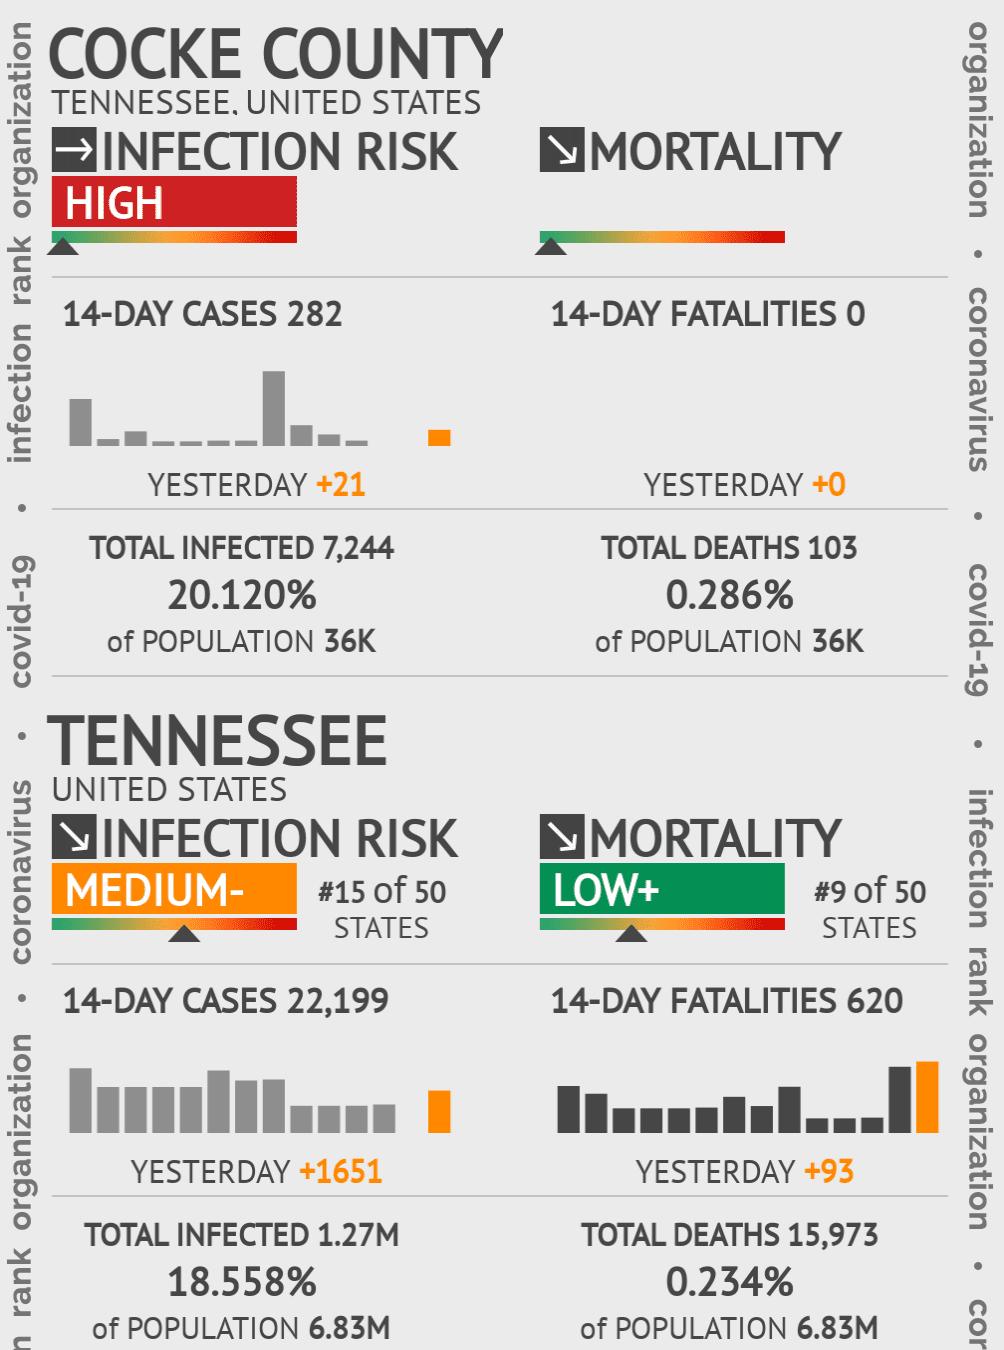 Cocke County Coronavirus Covid-19 Risk of Infection on July 24, 2021